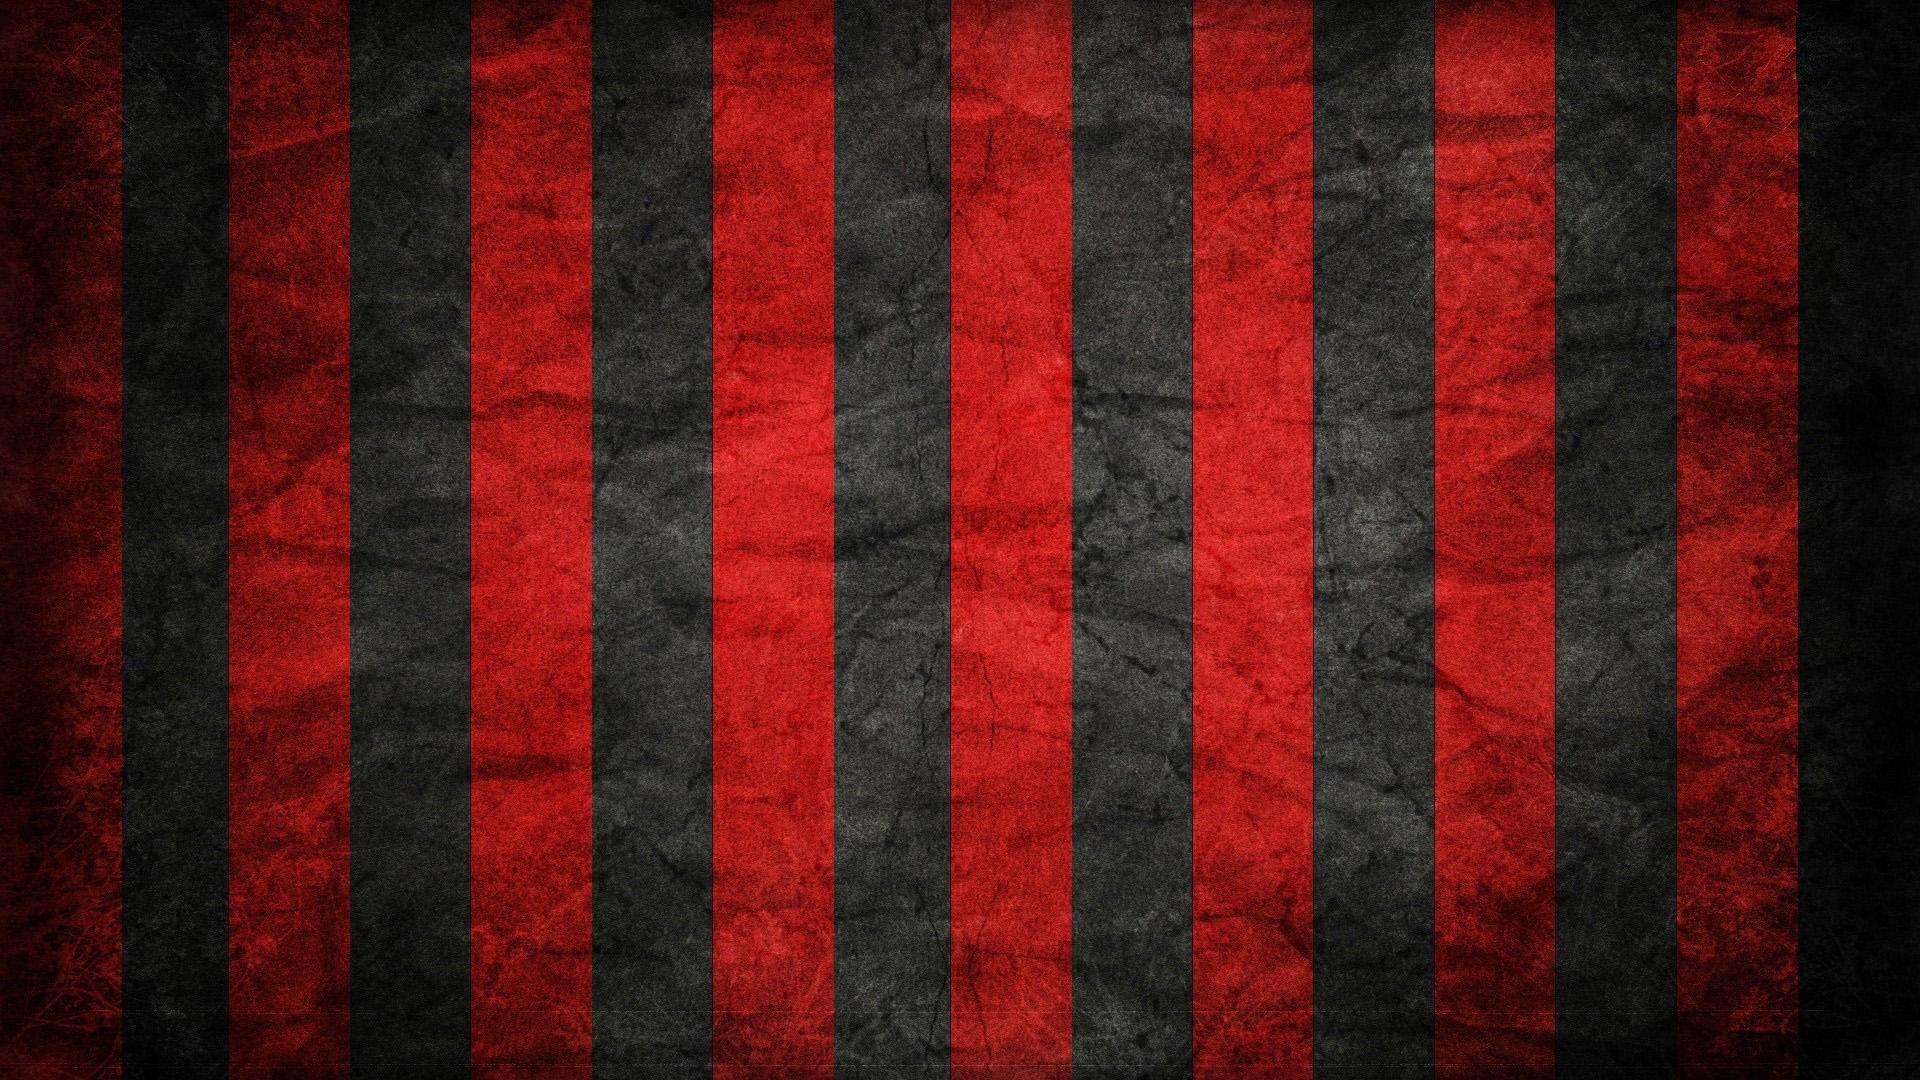 Cool 3d Basketball Wallpapers Black And Red Wallpaper Hd Pixelstalk Net